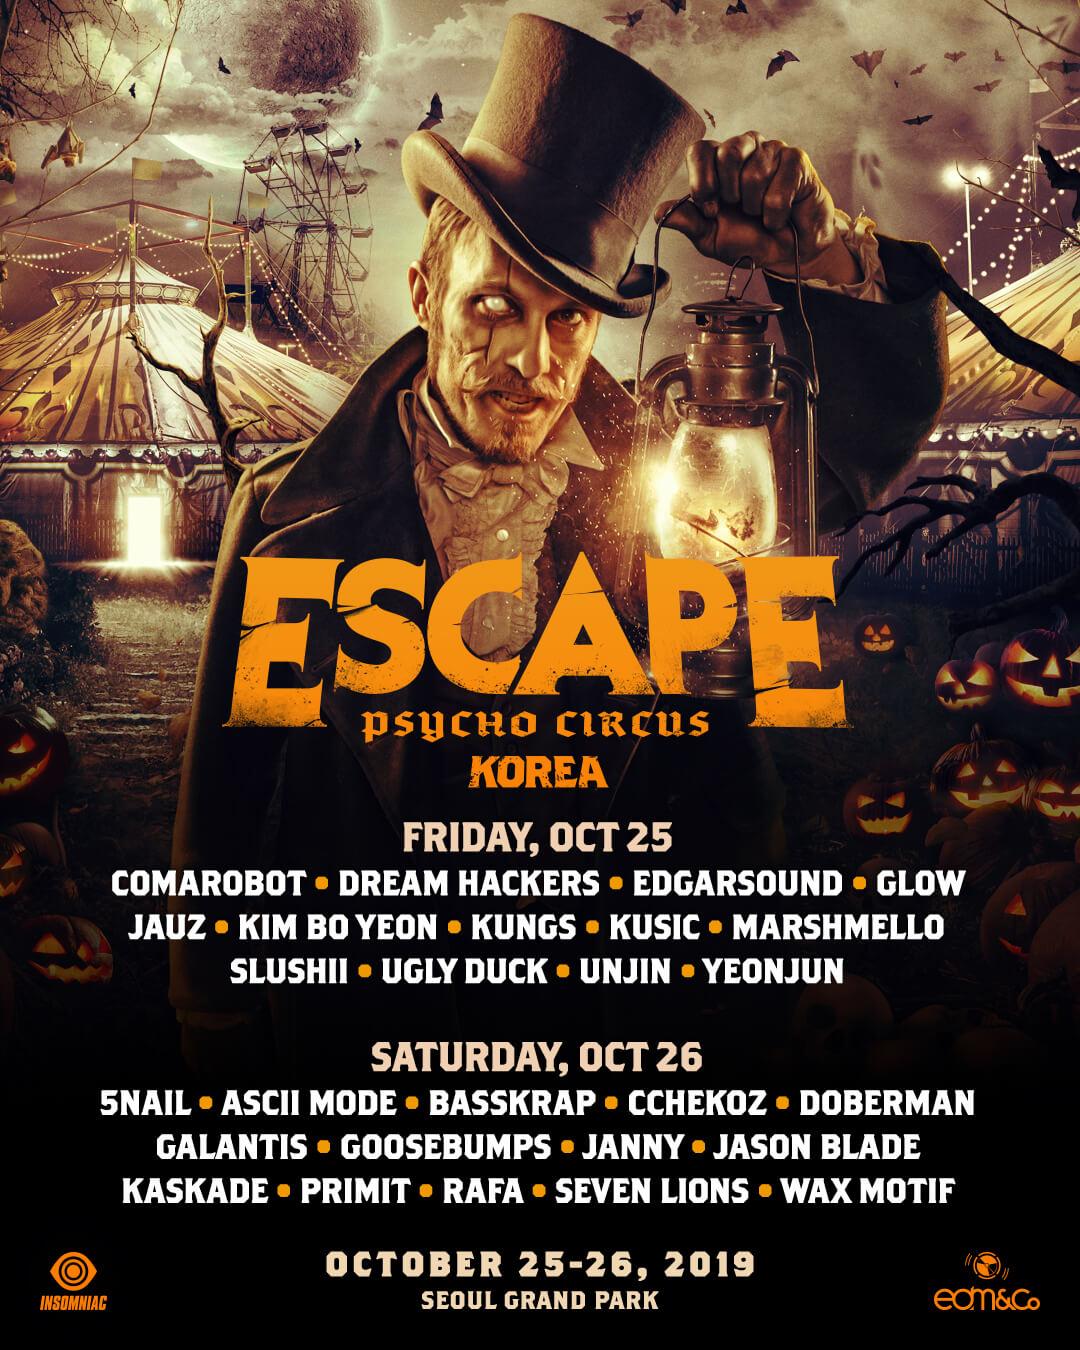 Escape Korea full lineup